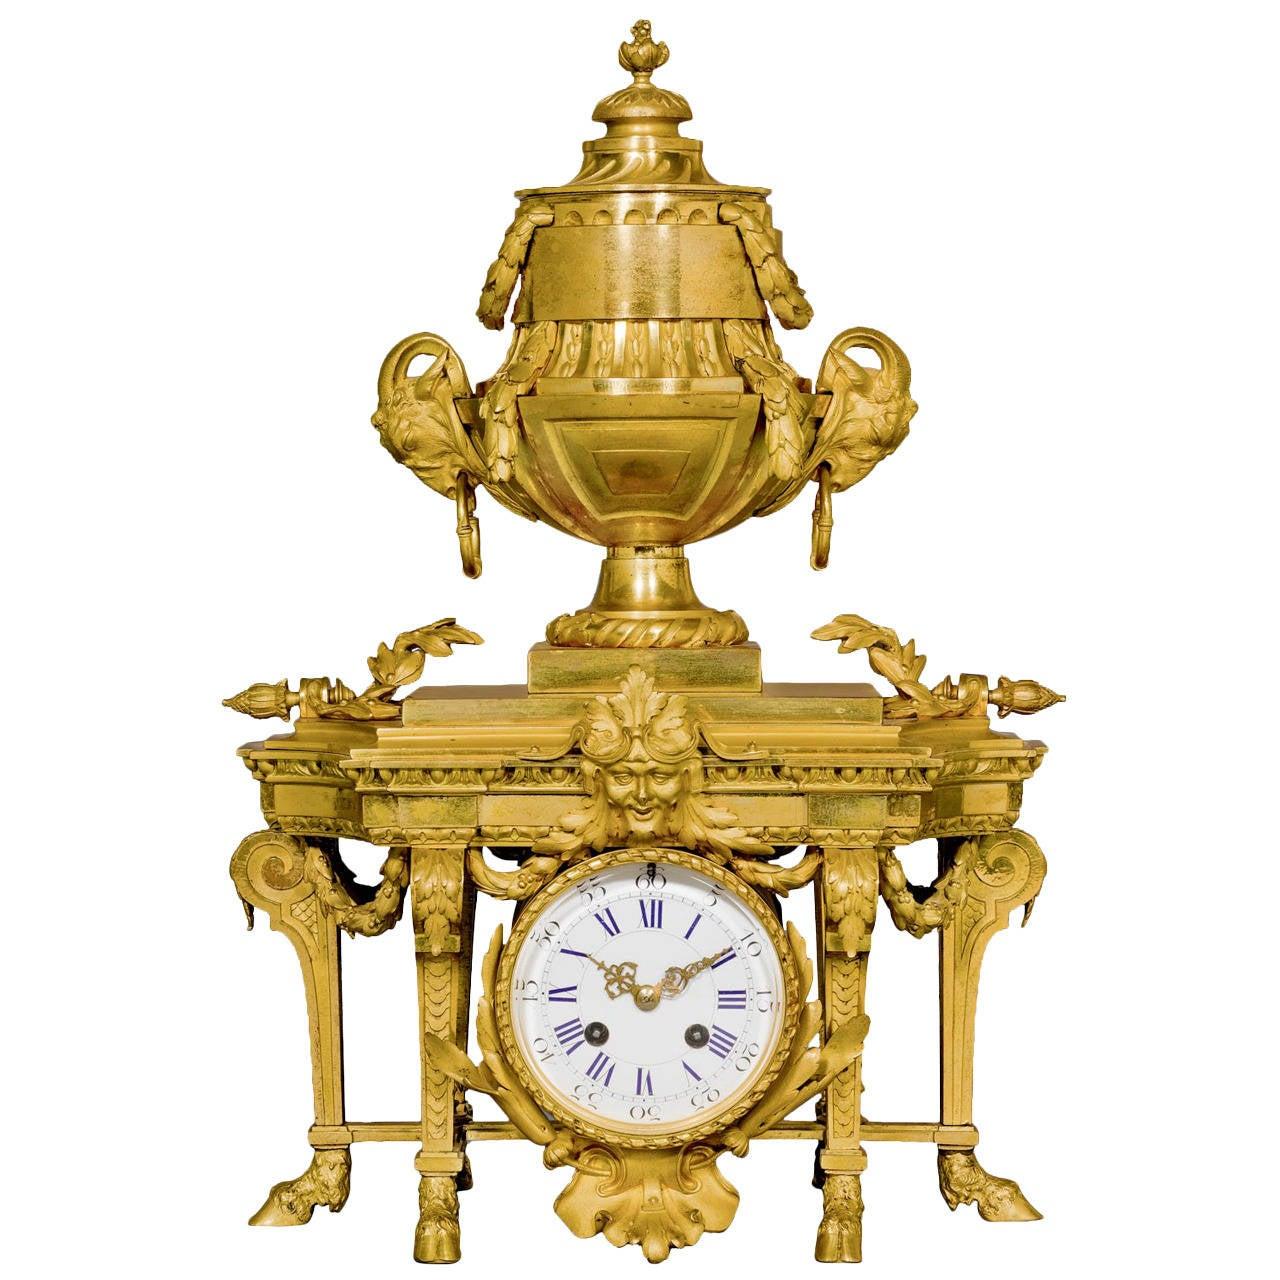 Louis XVI Style Ormolu Mantel Clock